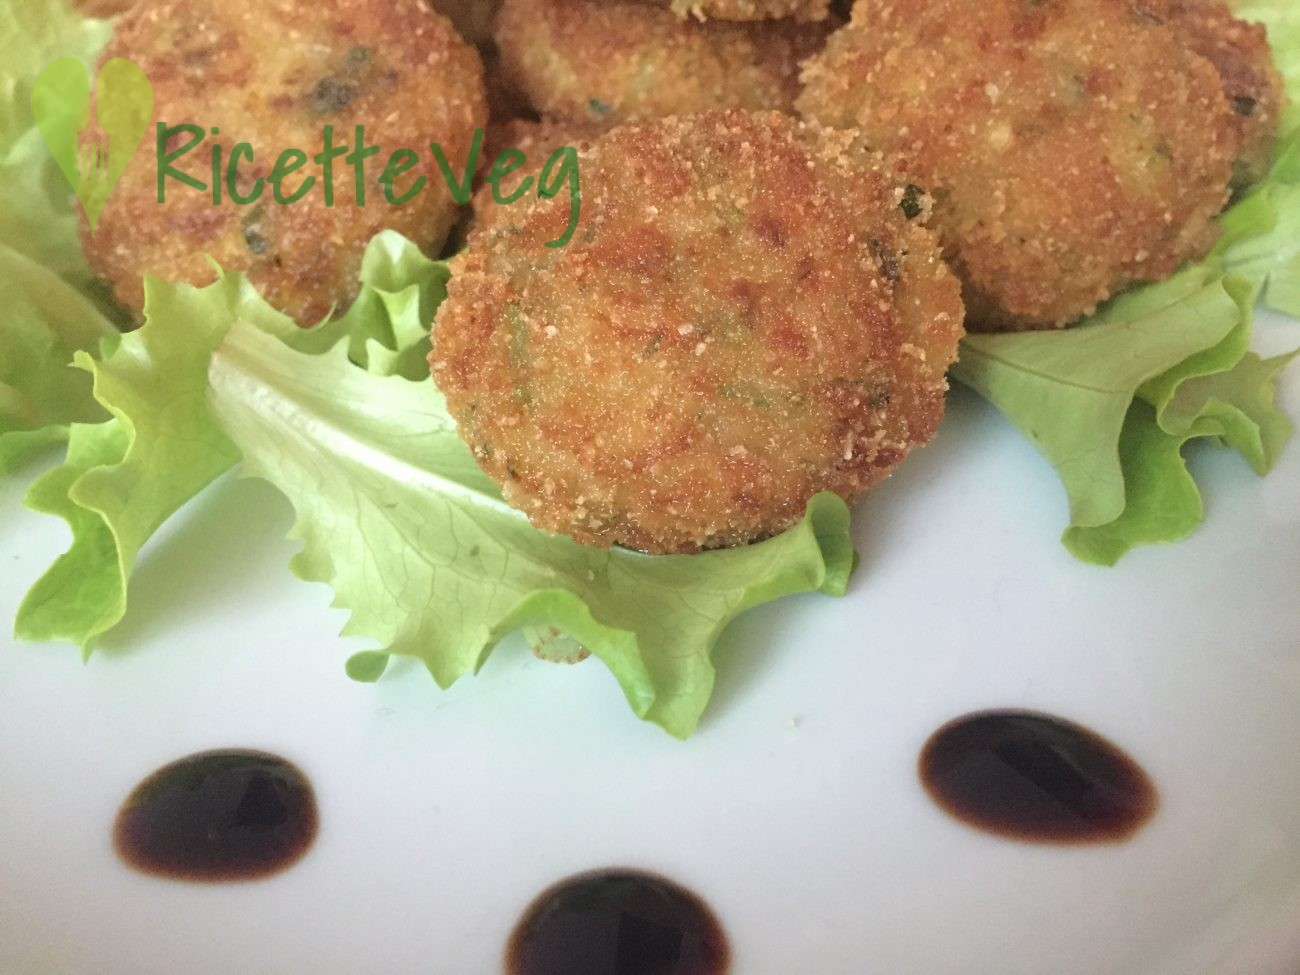 Polpette di soia e zucchine – Ricetta Vegetariana e Senza Glutine